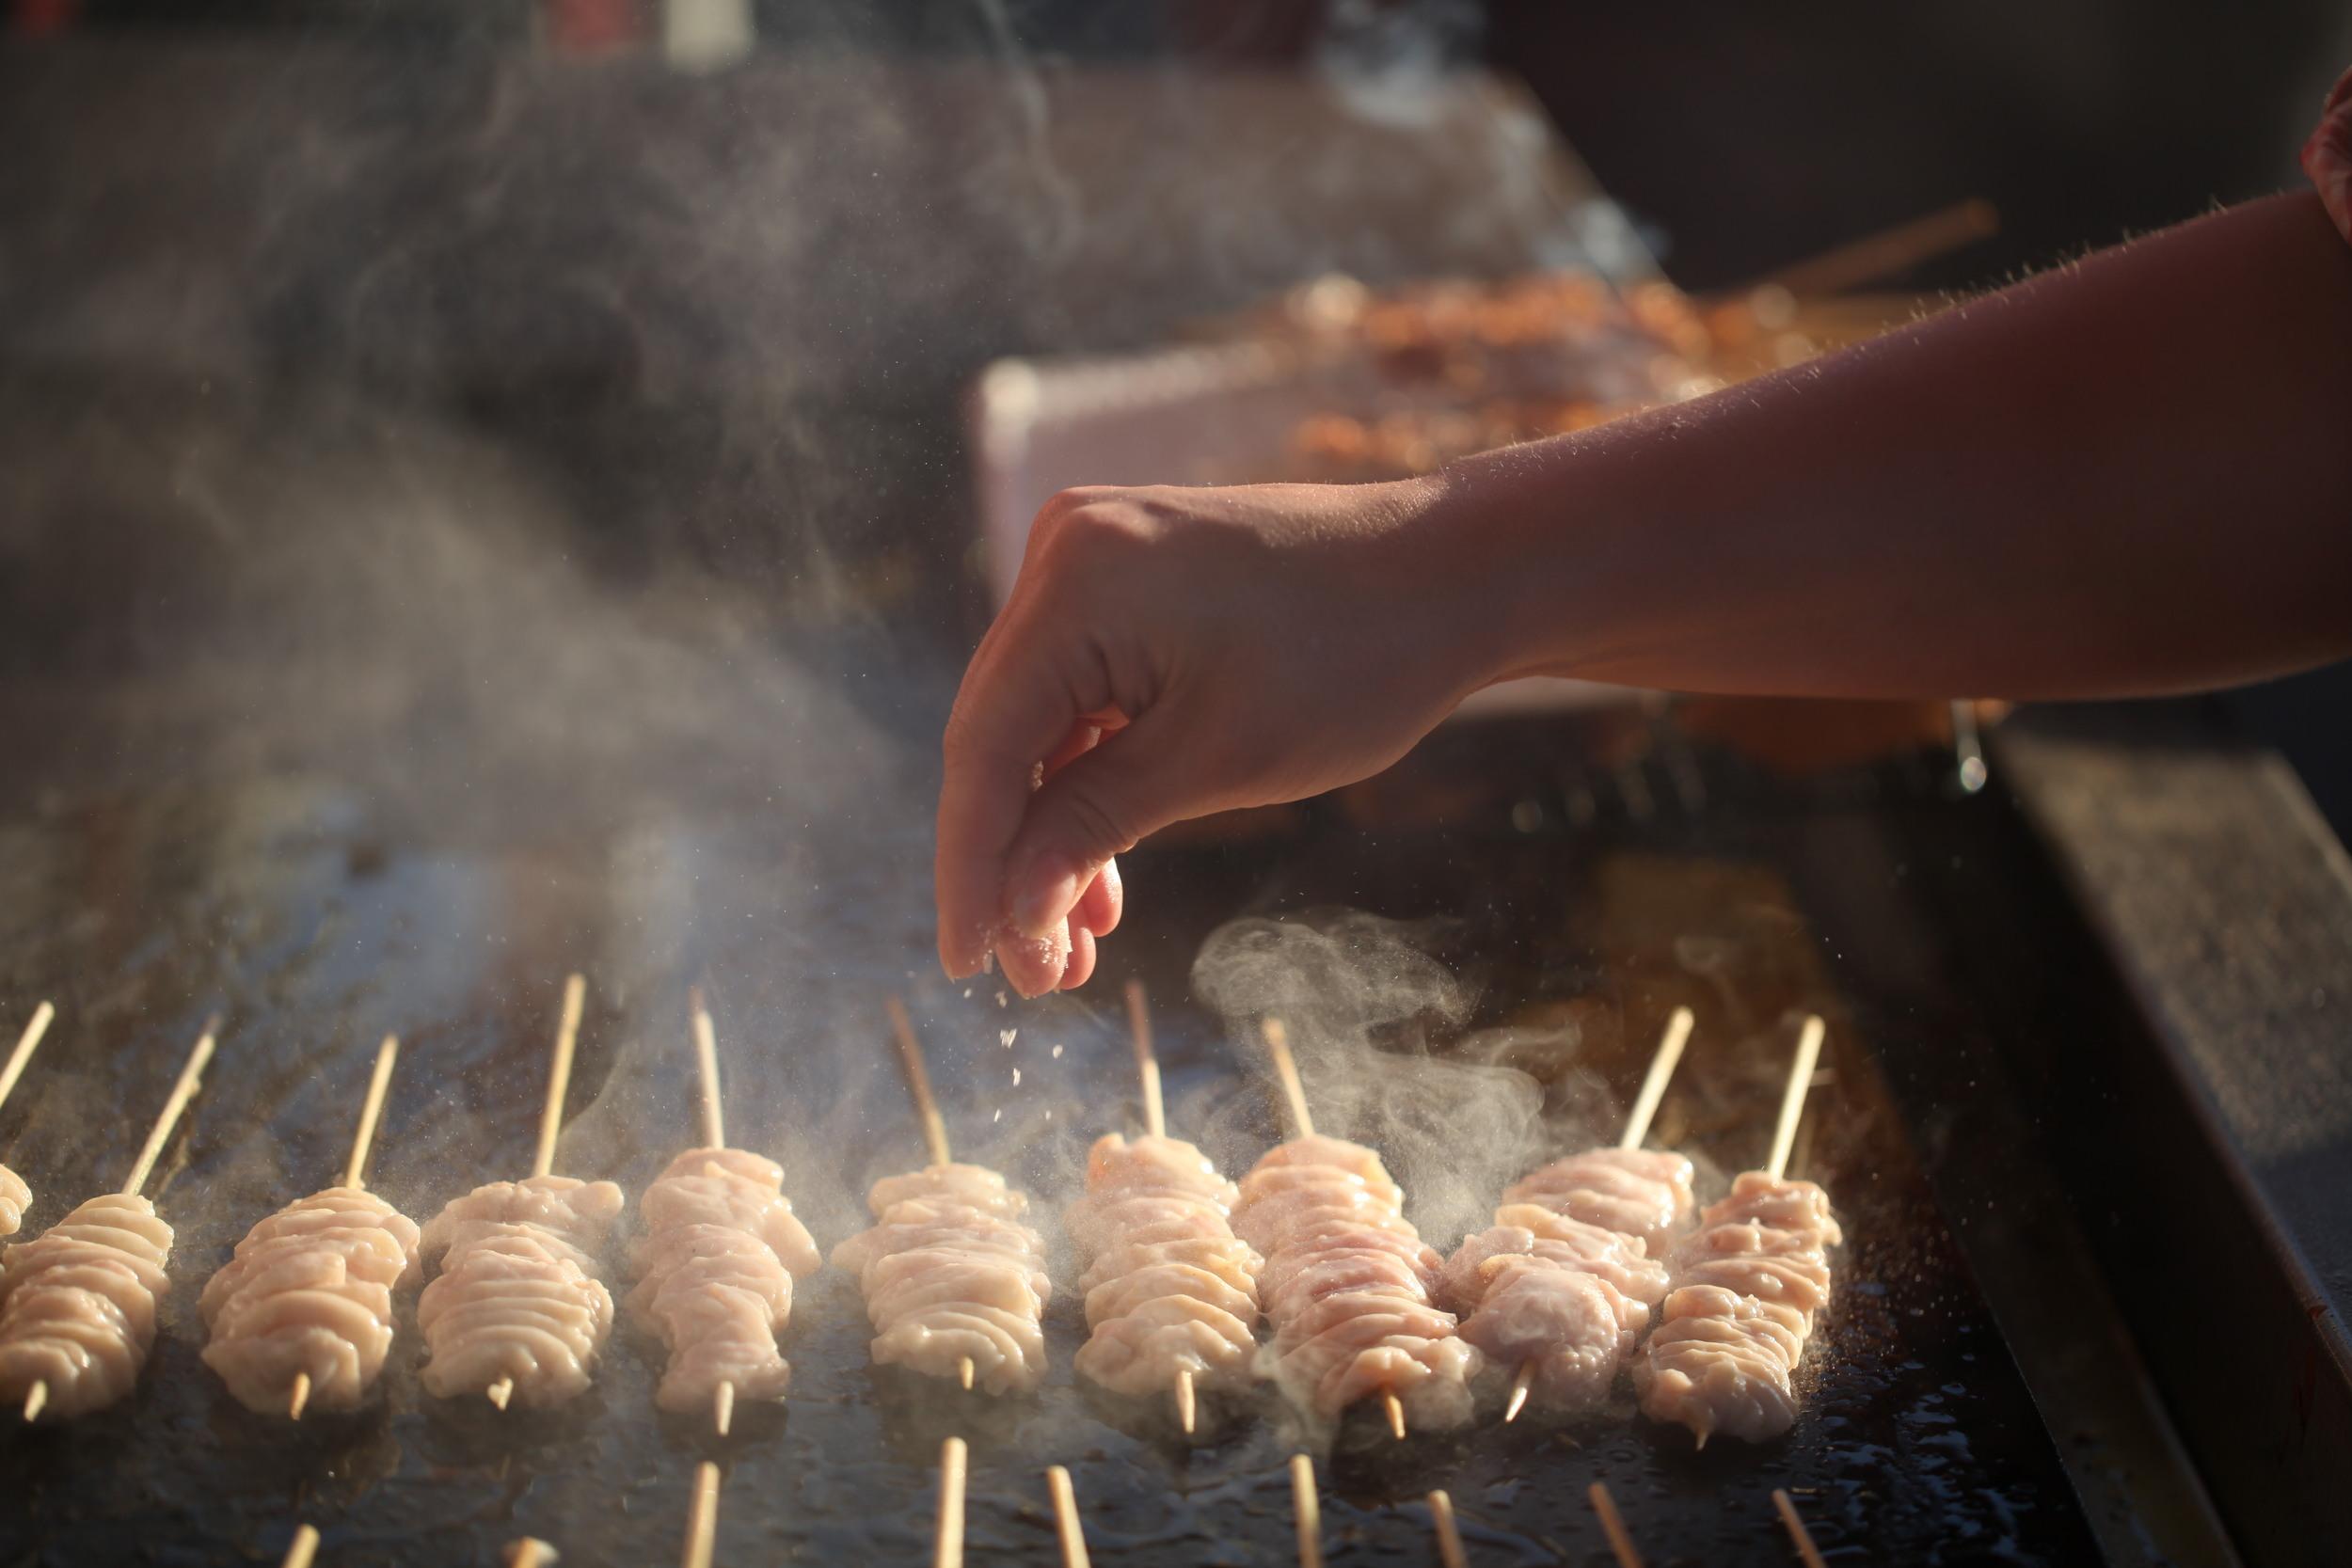 edible-adventure-010-ramen-burgers-and-more_13888066080_o.jpg